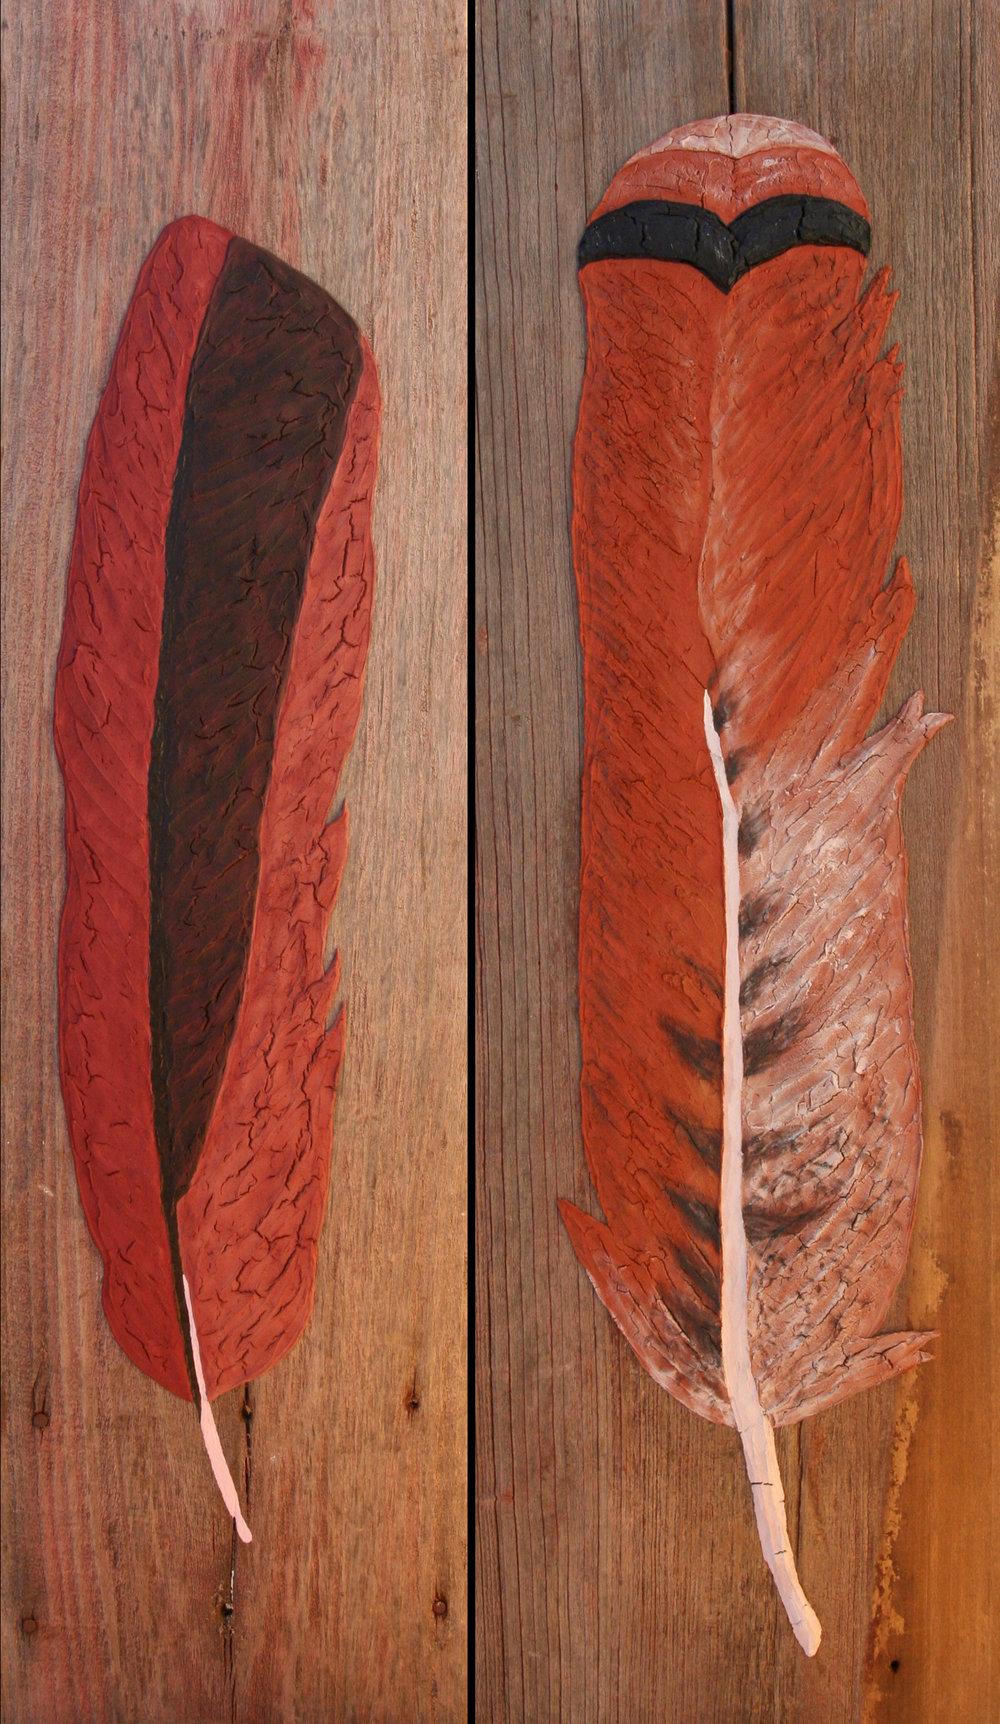 Cardinal | plaster, acrylic on barn siding | 9.5 x 36 | $160 Red-tailed Hawk | plaster, acrylic on barn siding | 10.5 x 36 | sold